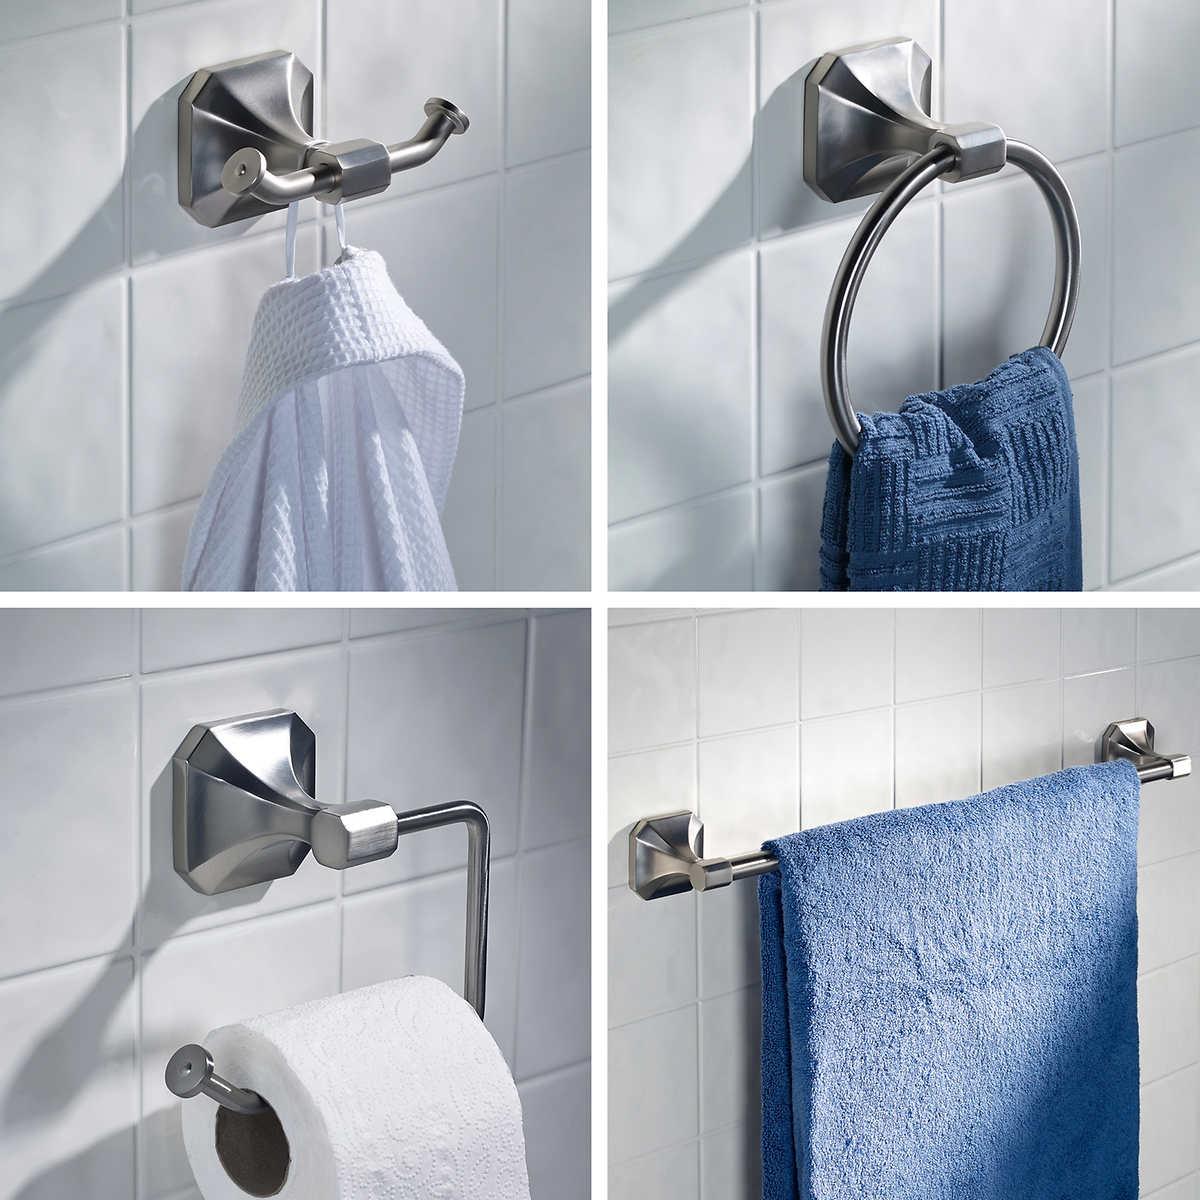 Richelieu Bathroom Accessory Kit 4 Piece